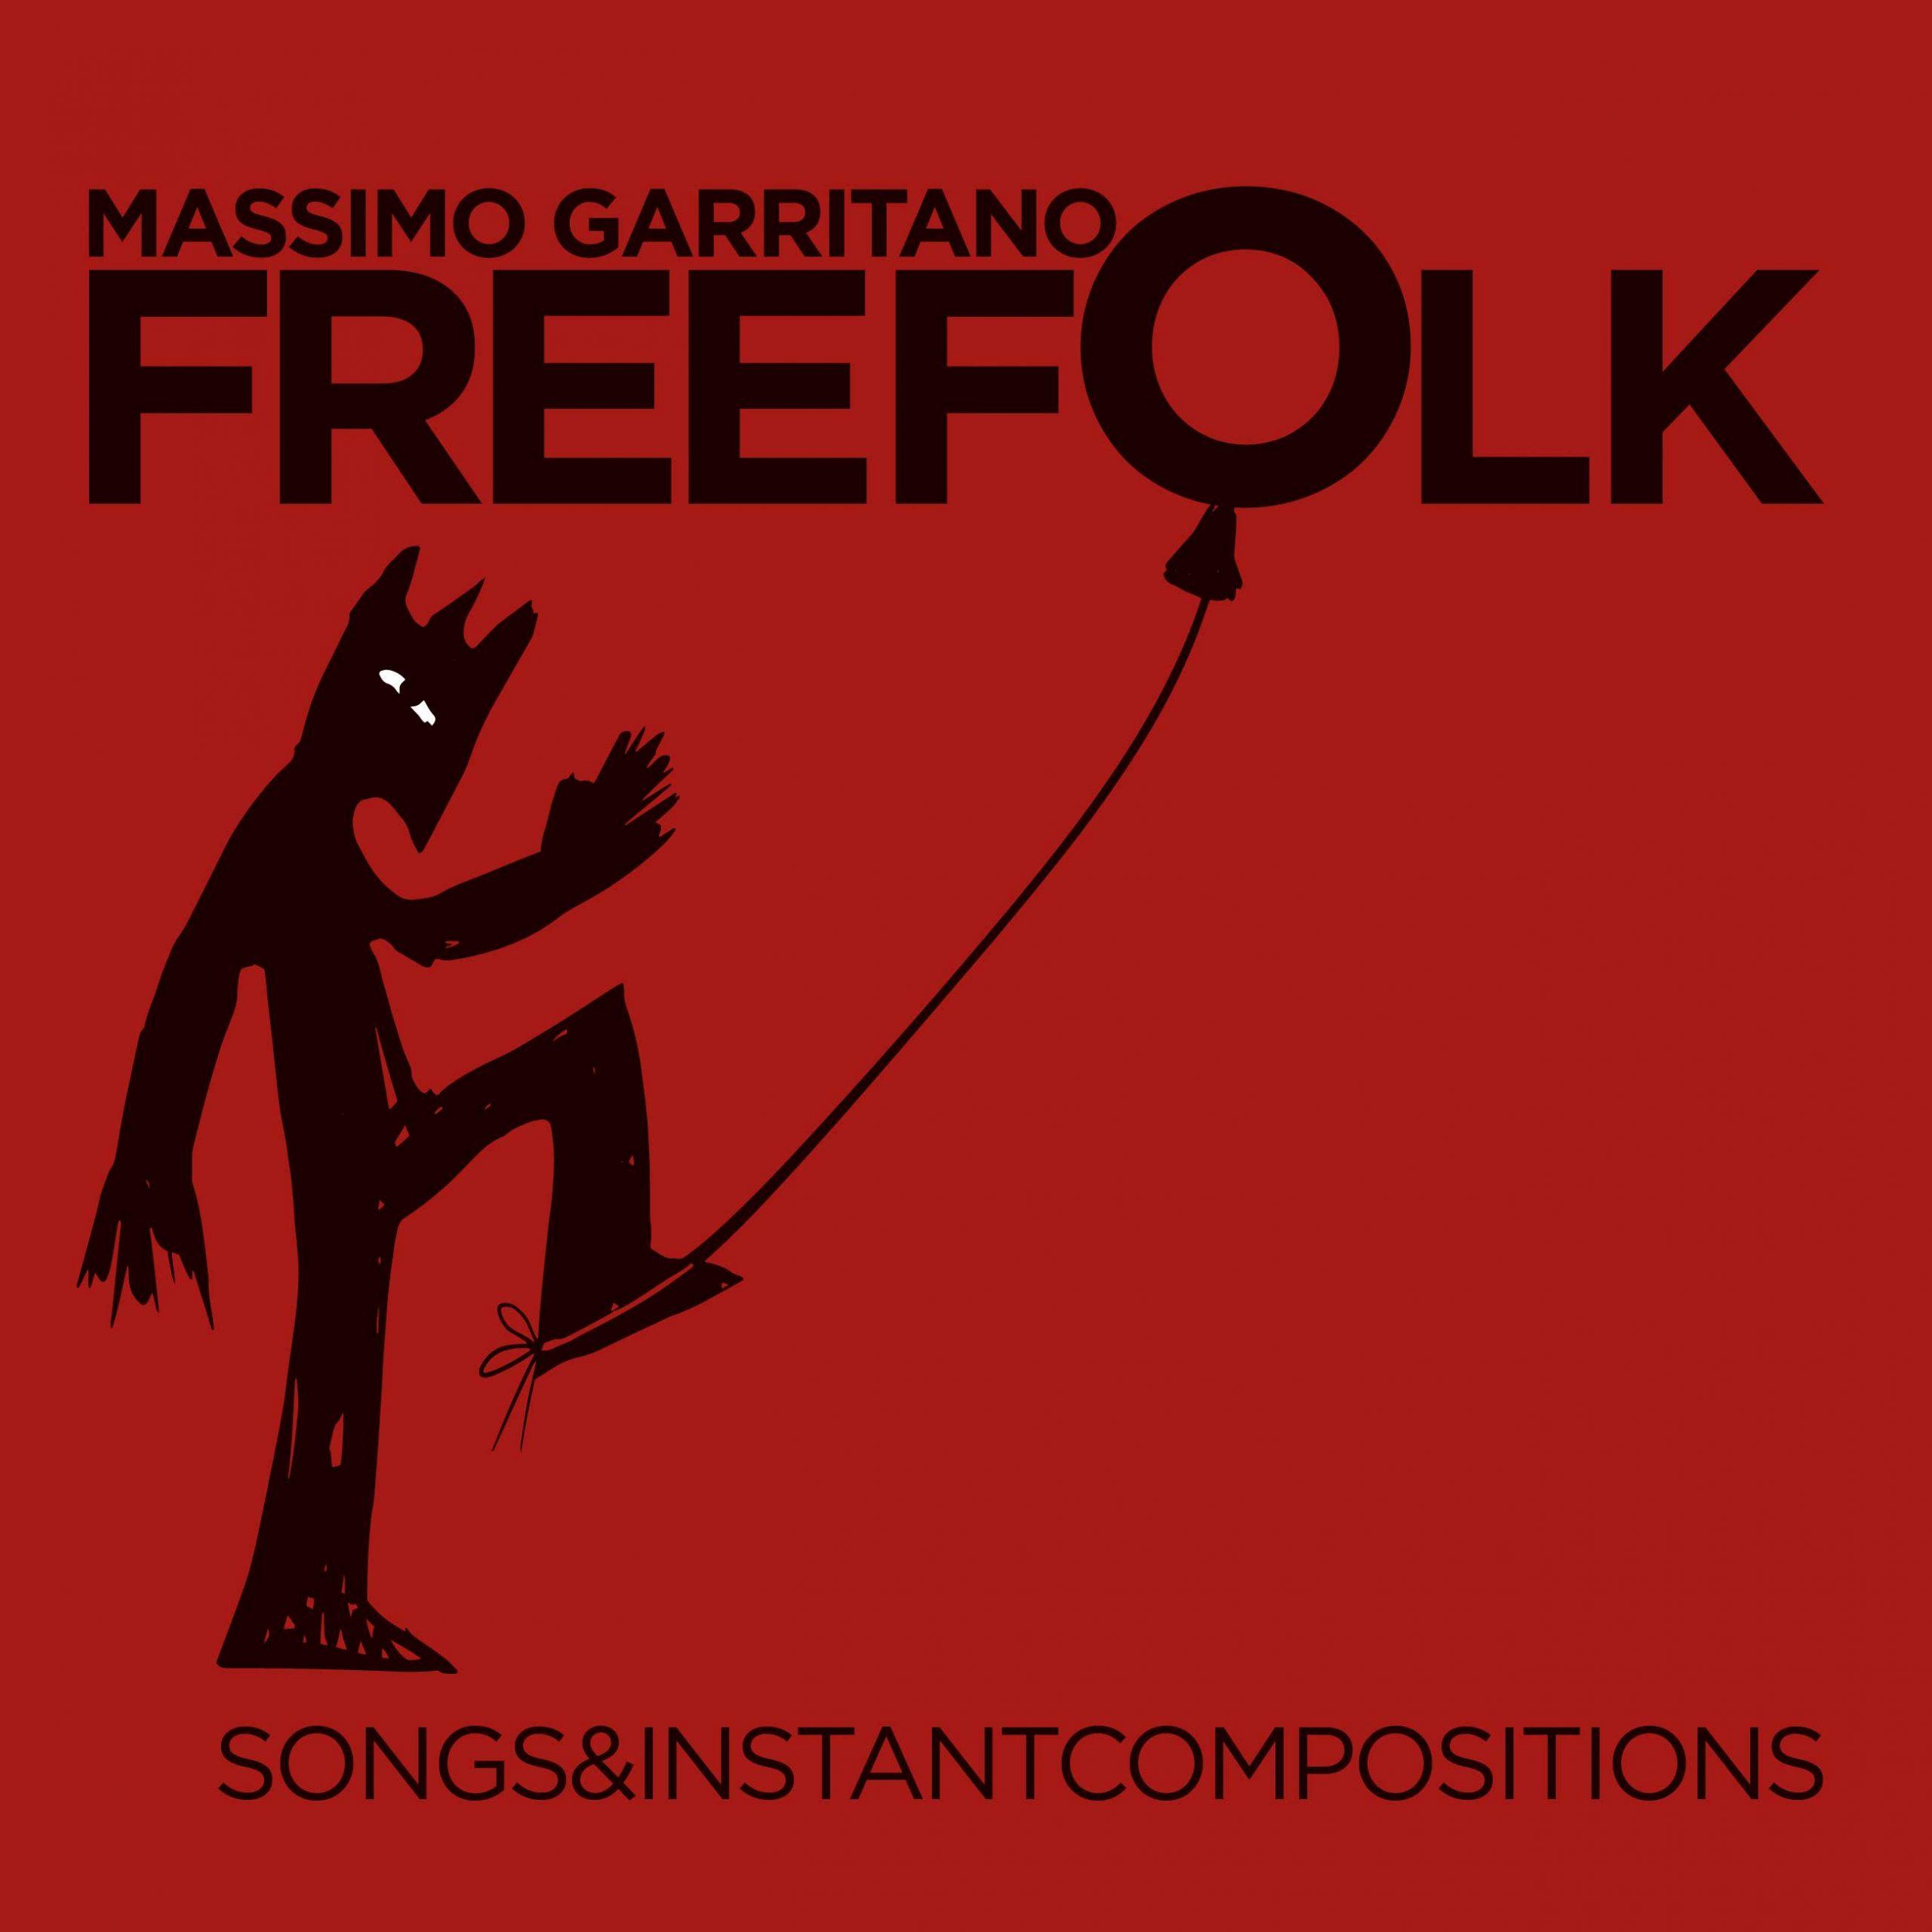 Free Folk manitu records